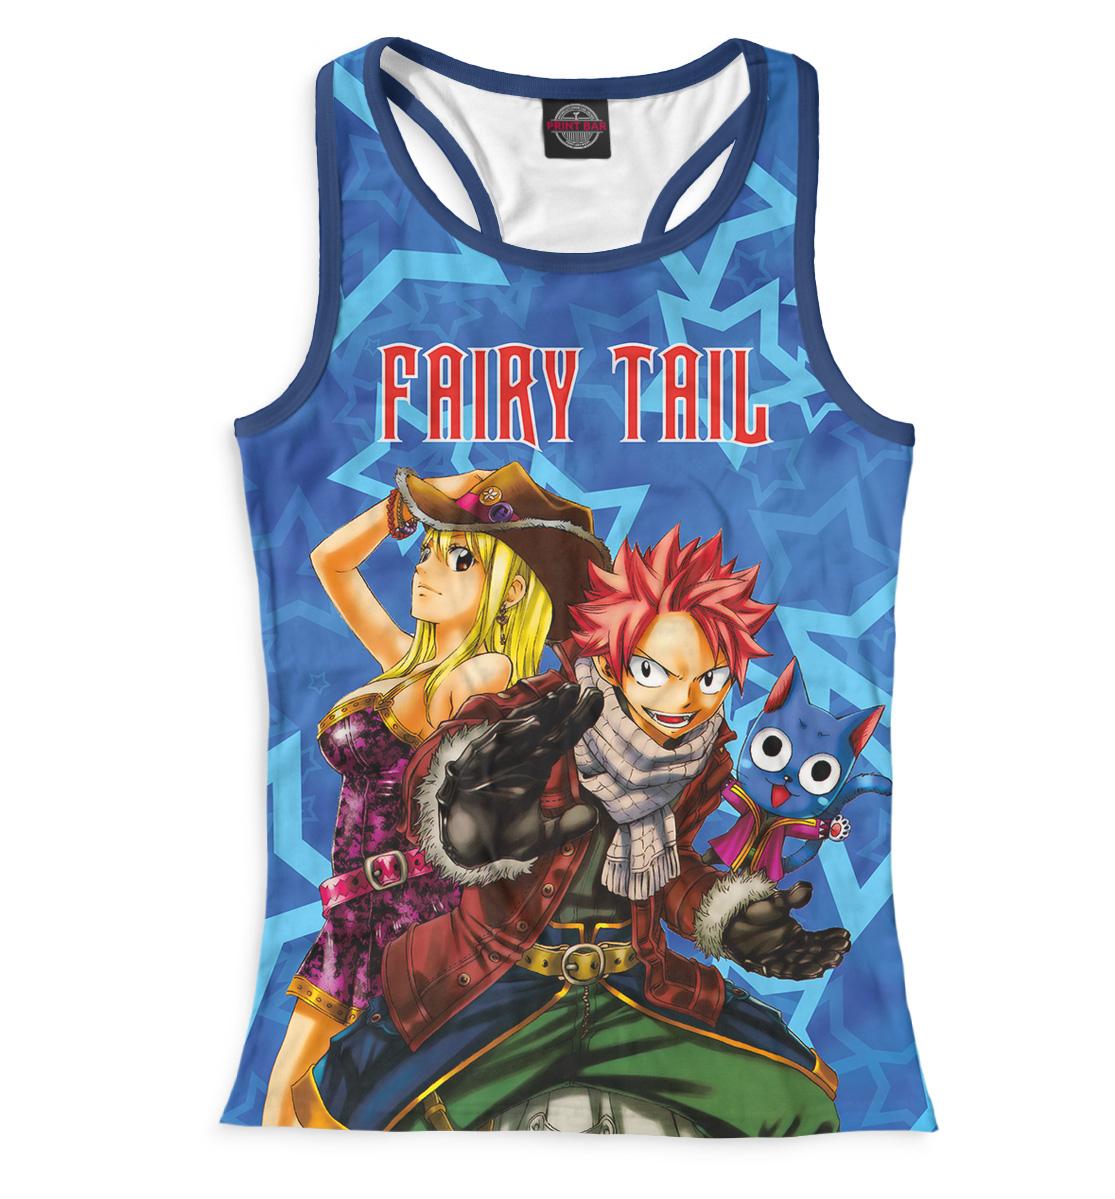 Купить Fairy Tail, Printbar, Майки борцовки, FYT-350573-mayb-1